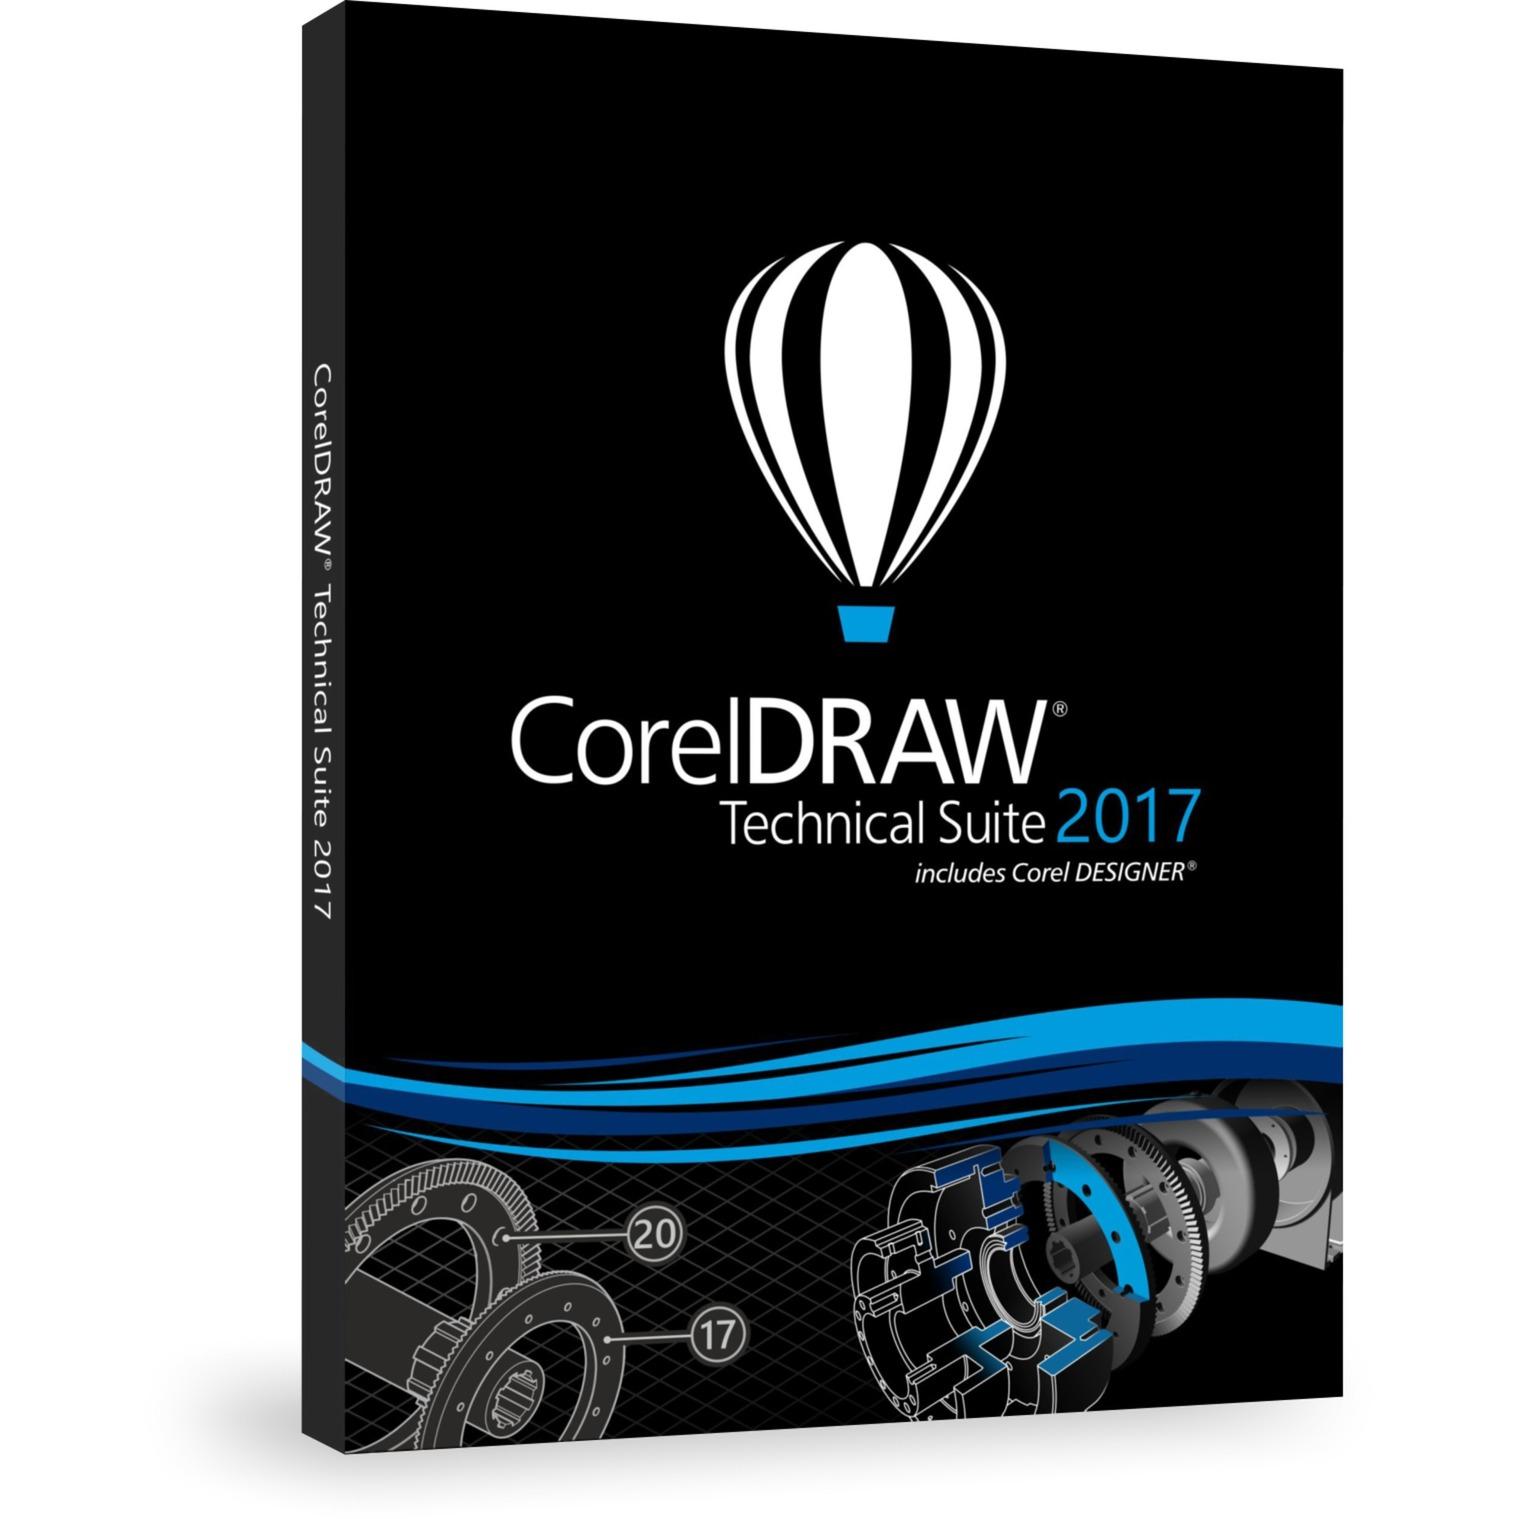 CorelDRAW Technical Suite 2017, Software